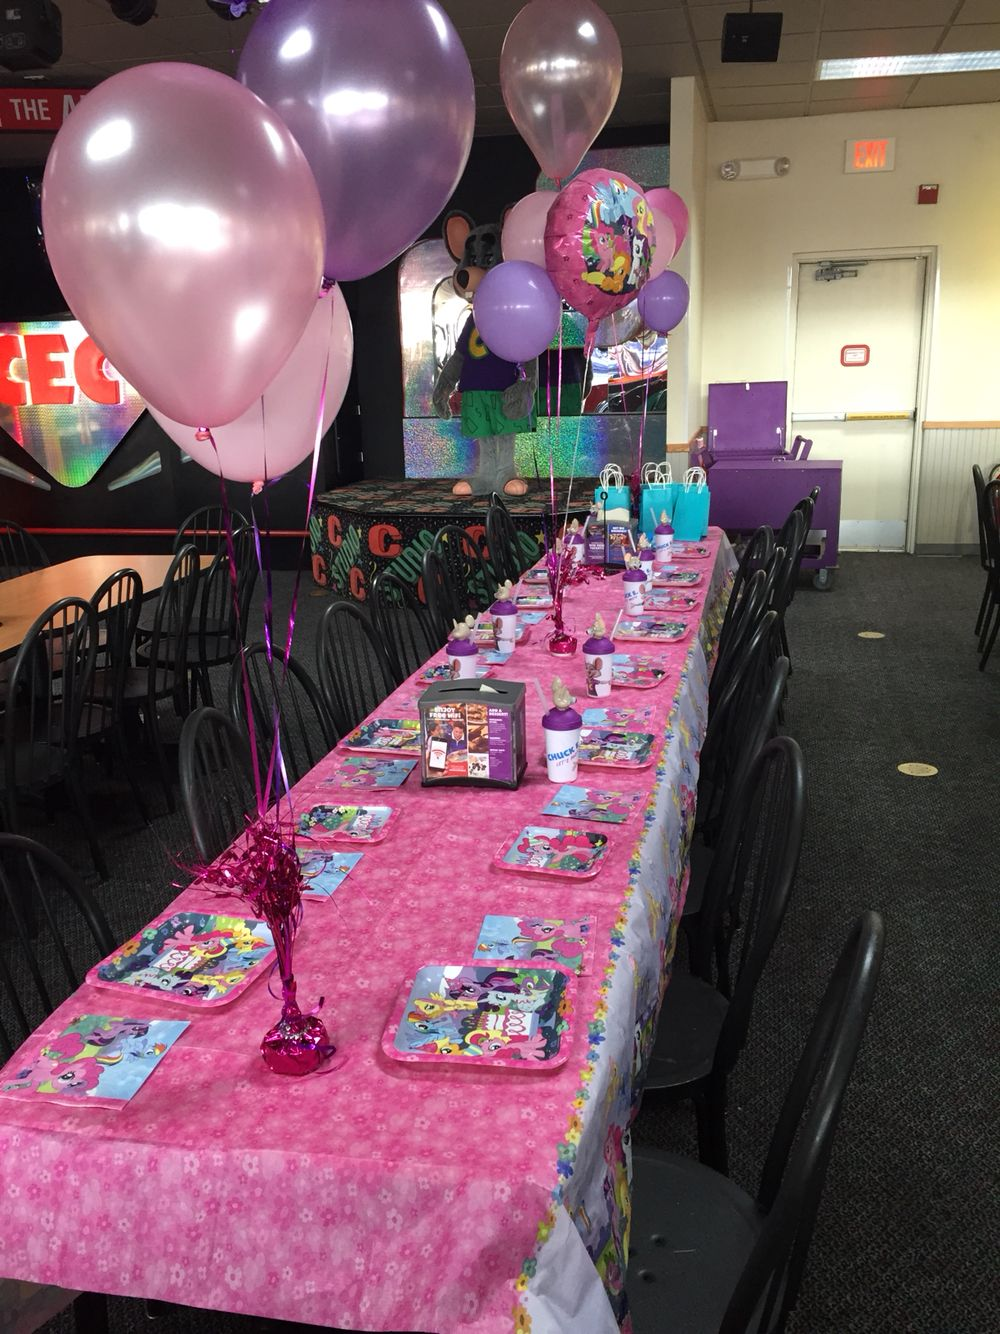 My Little Pony Party At Chuck E Cheese S Disney Princess Birthday Party Chucky Cheese Birthday Party Pokemon Birthday Party